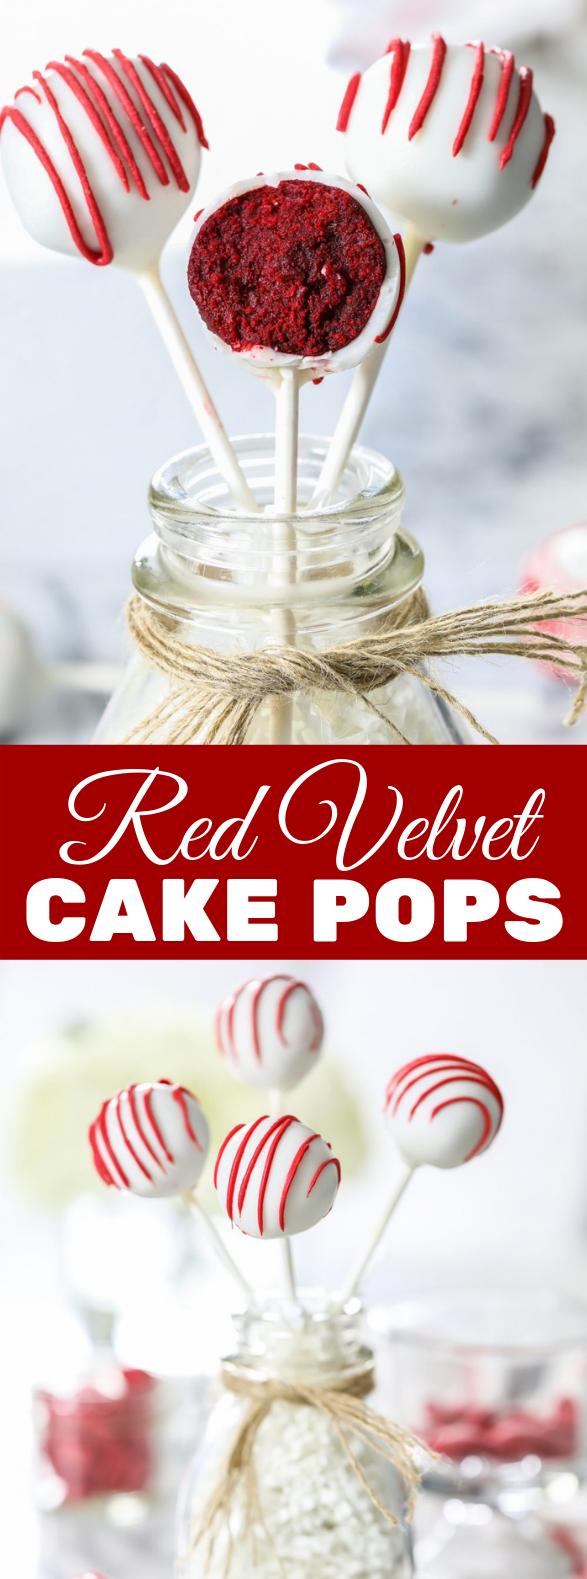 Red Velvet Cake Pops Recipe #desserts #partyrecipe